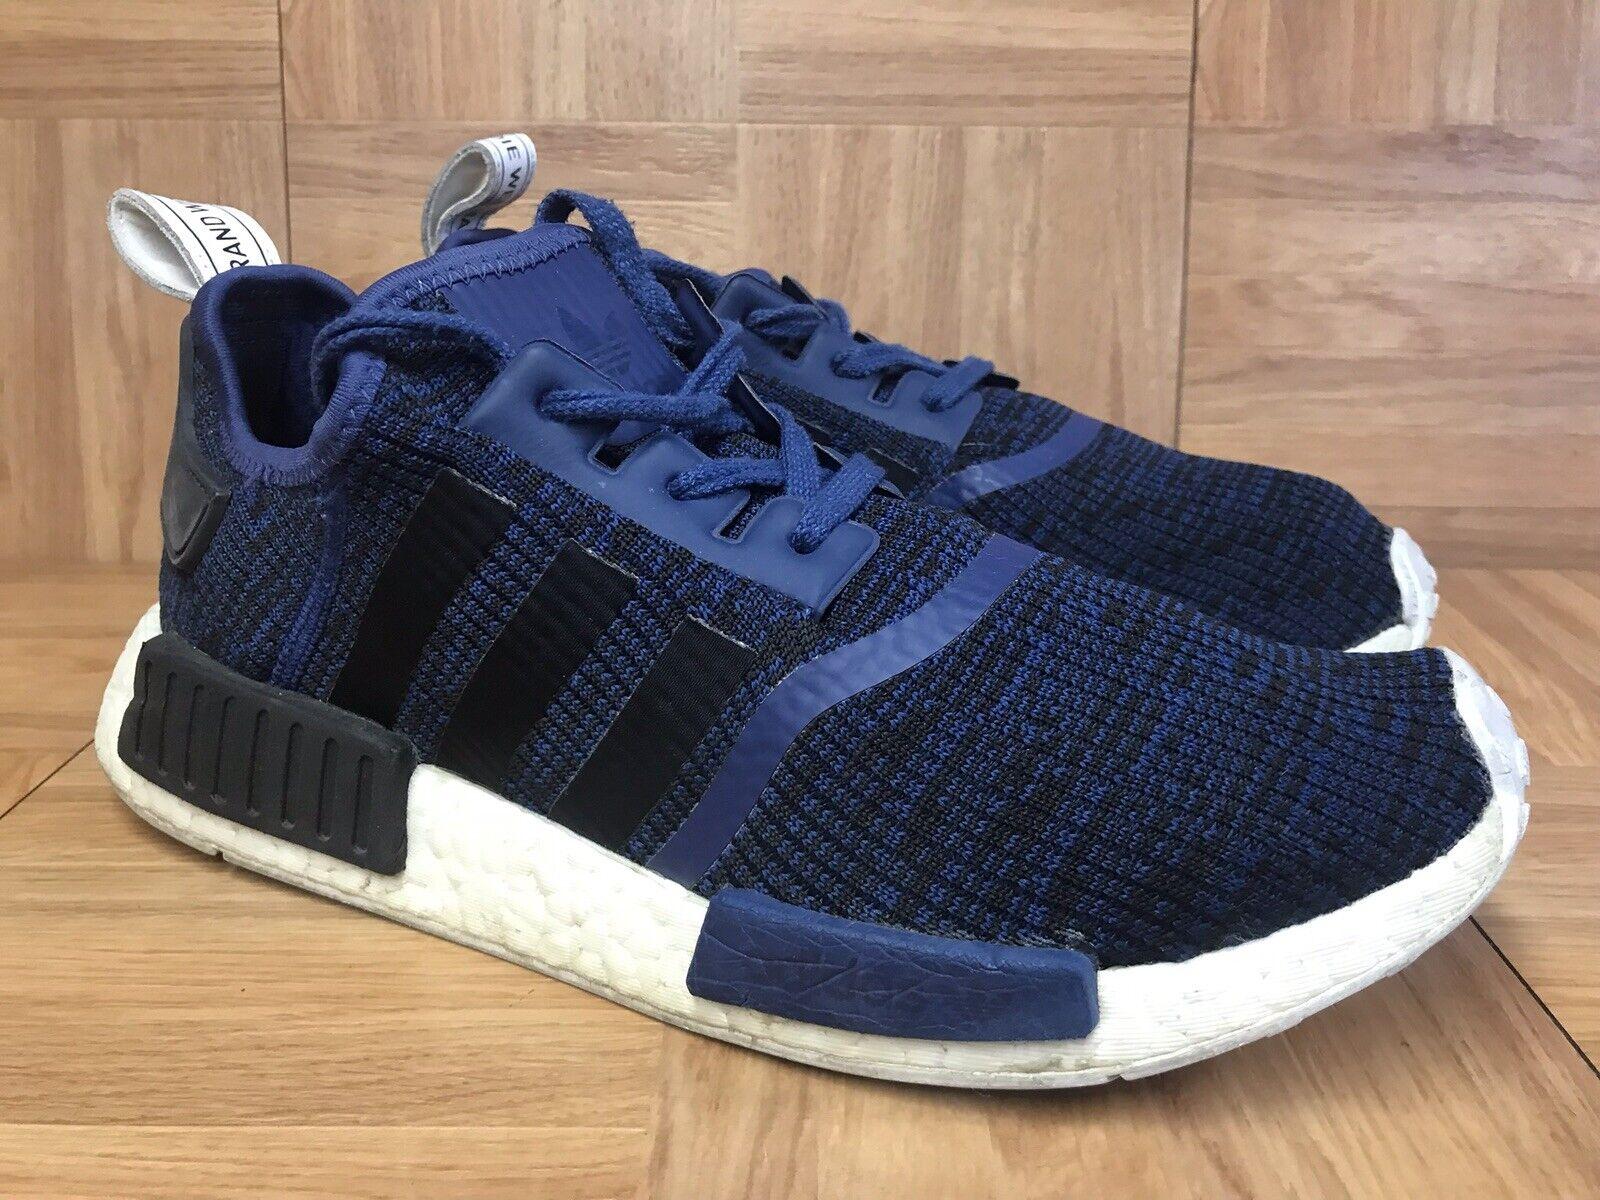 RARE Adidas Originals NMD_R1 Navy bluee Black White BY2775 Sz 10 Men's shoes